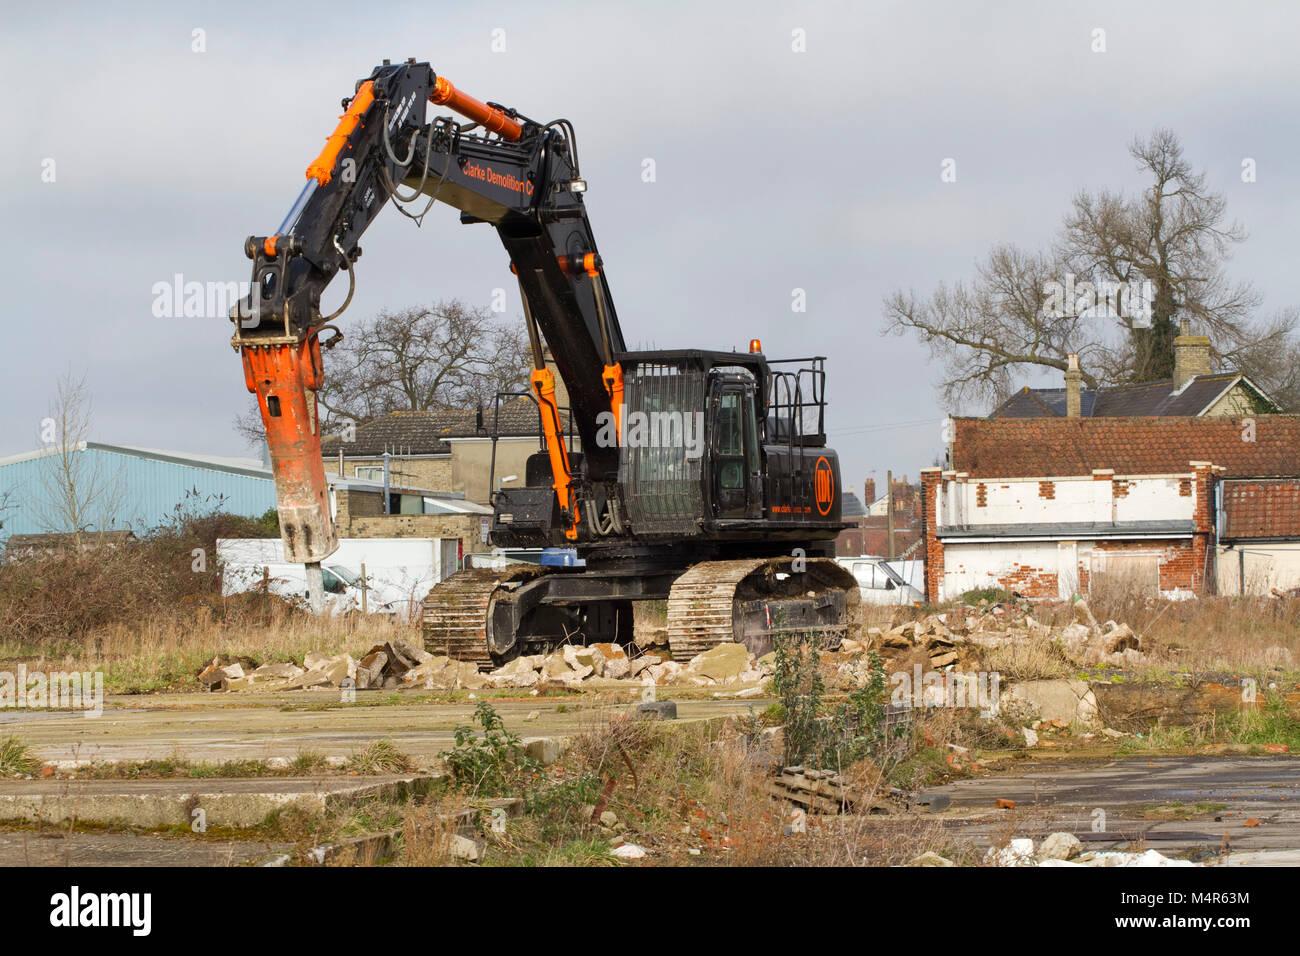 Large tracked machine breaking up concrete - Stock Image